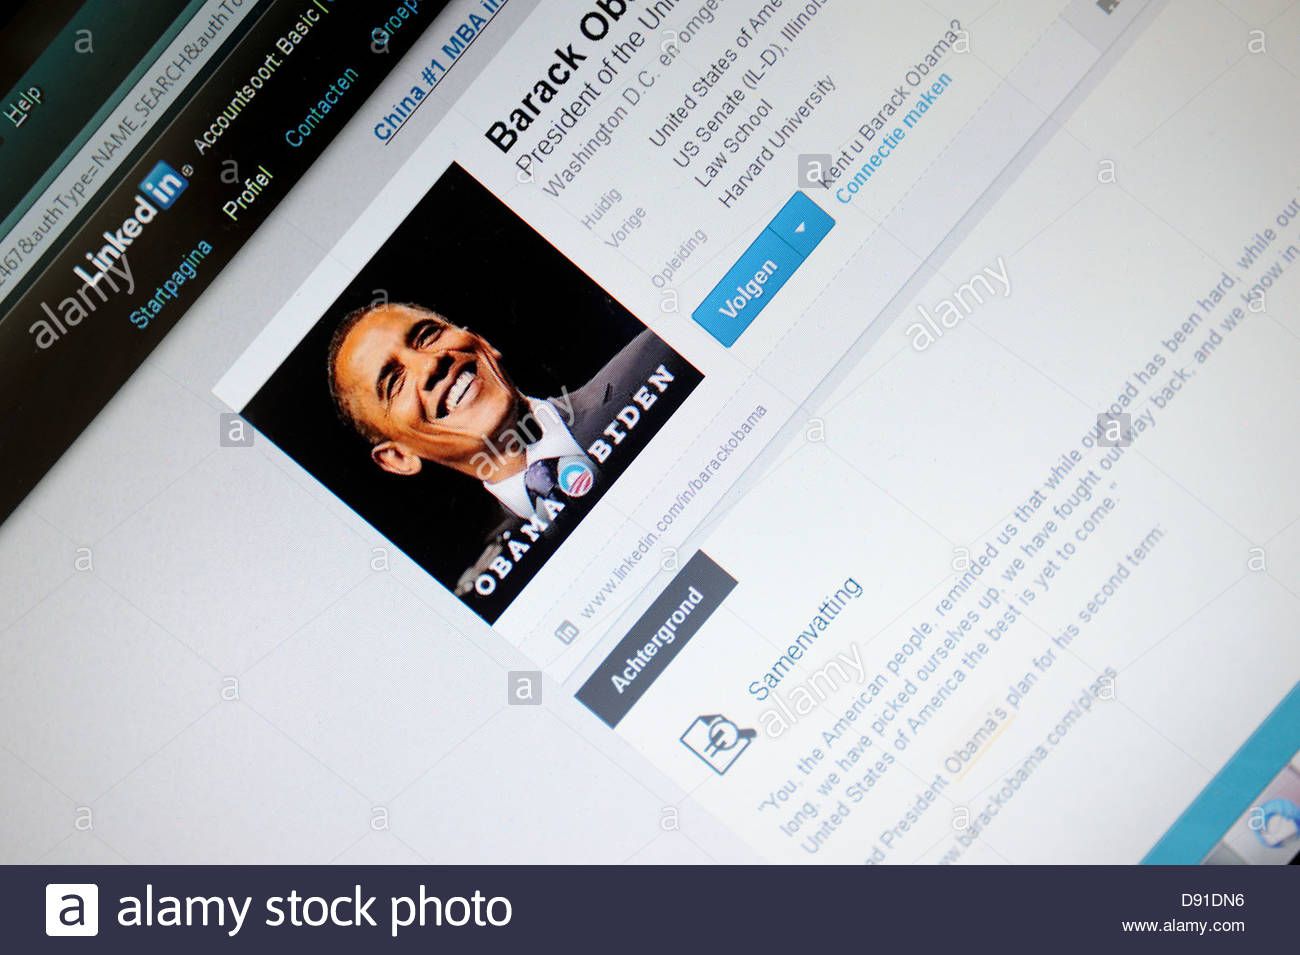 Internet Linkedin page Barack Obama - Stock Image